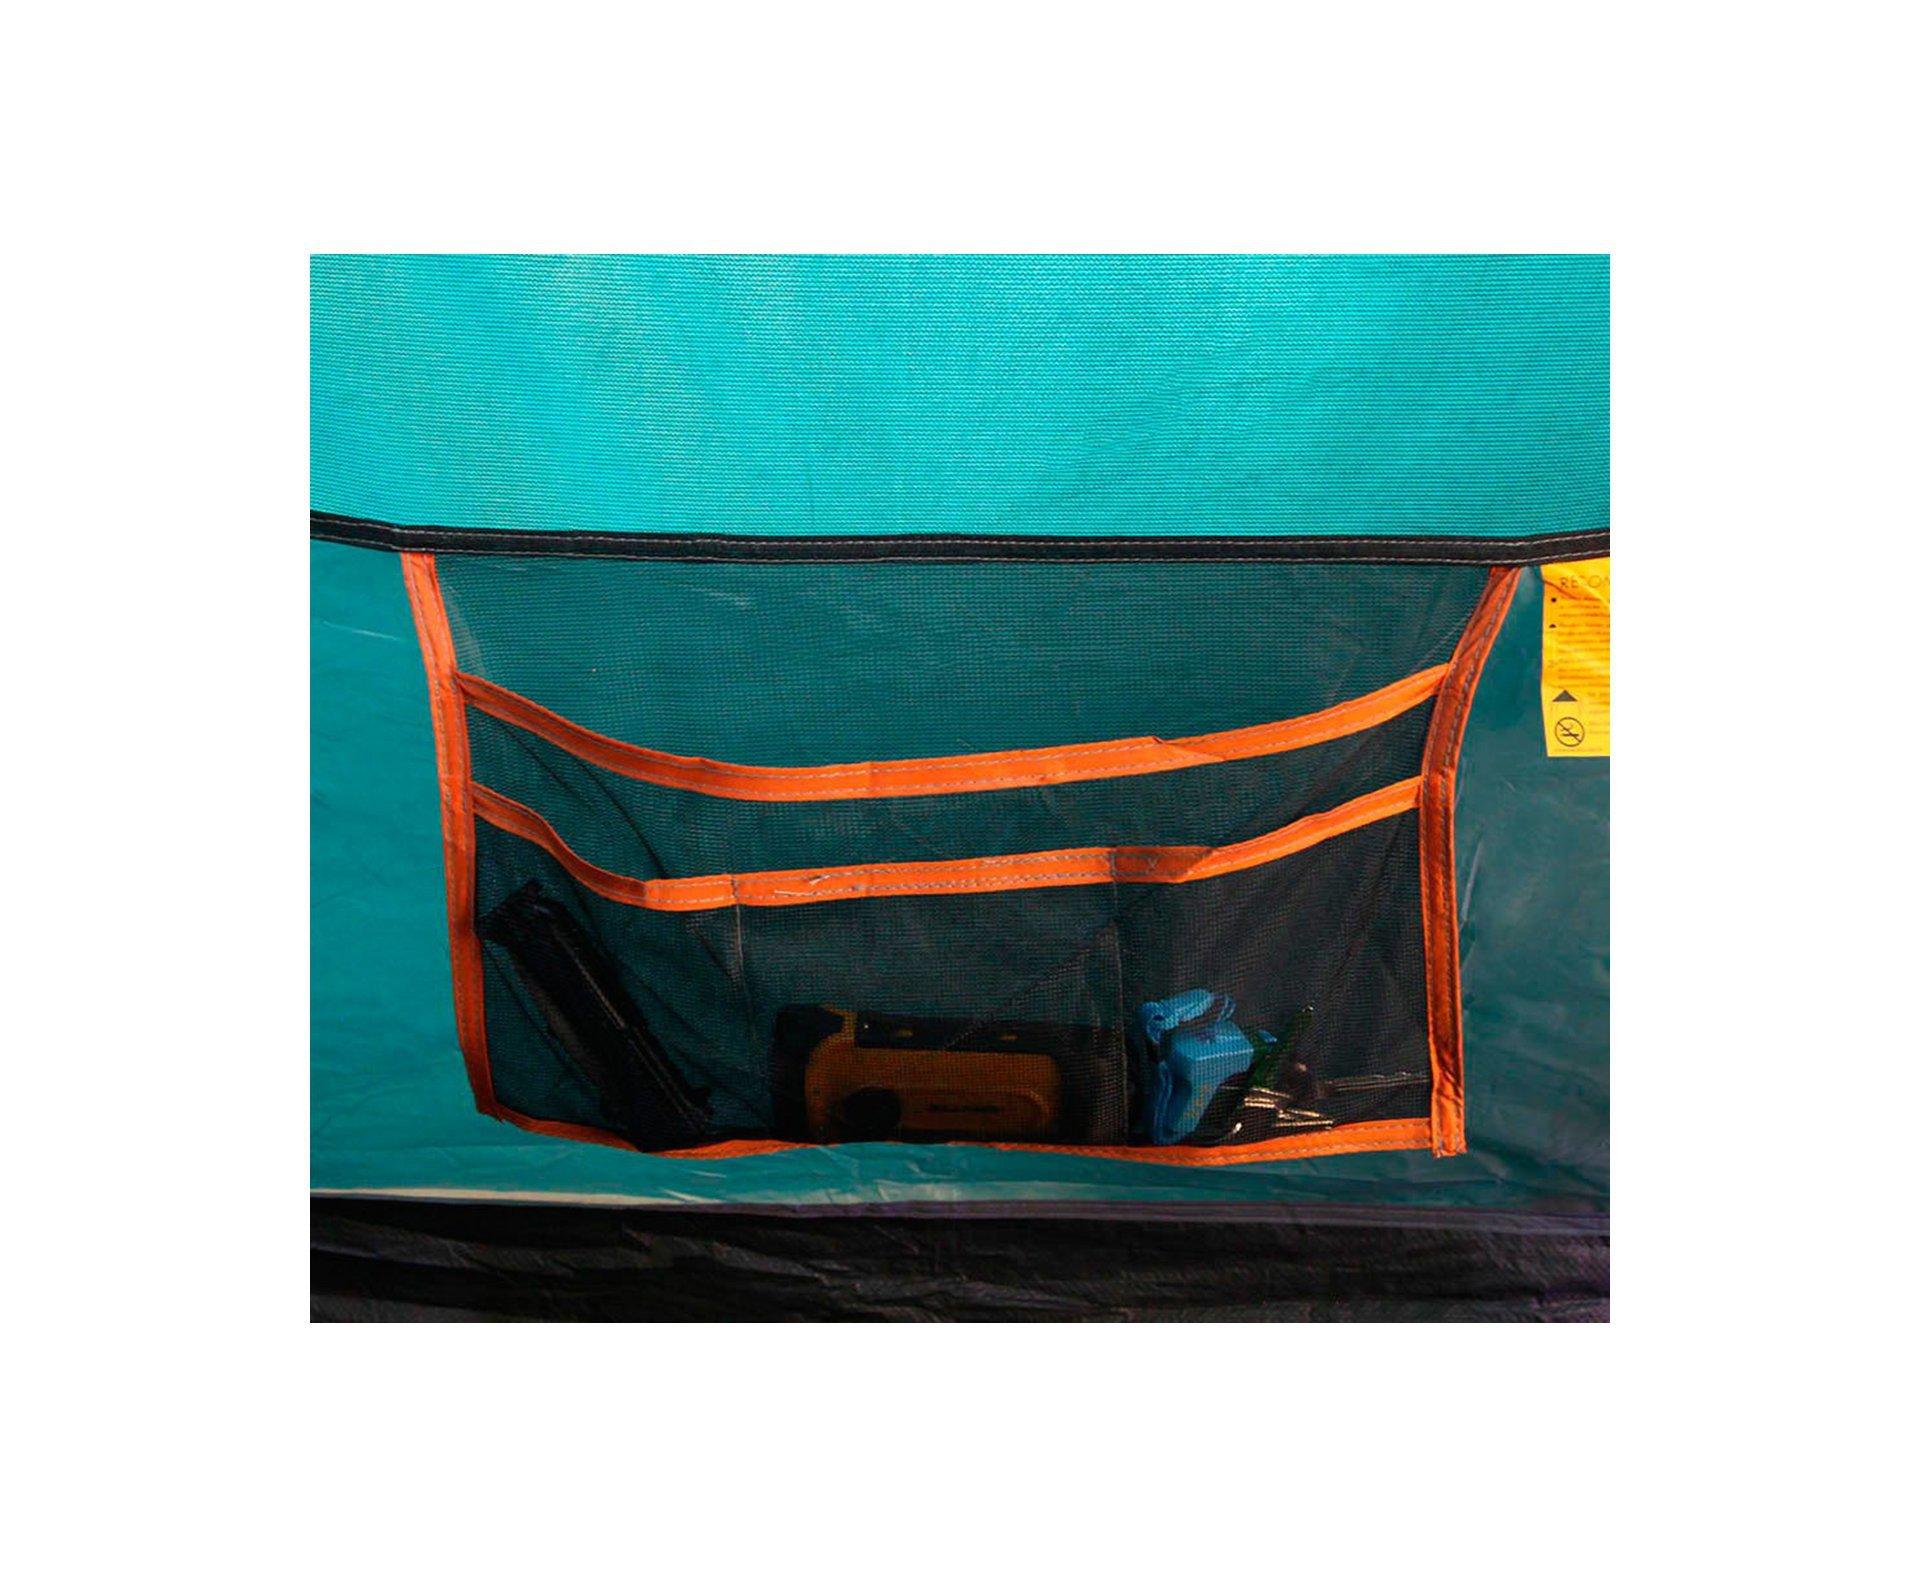 Barraca Camping Gt 5/6 Pessoas Savanah 2500mm Coluna Agua Nautika